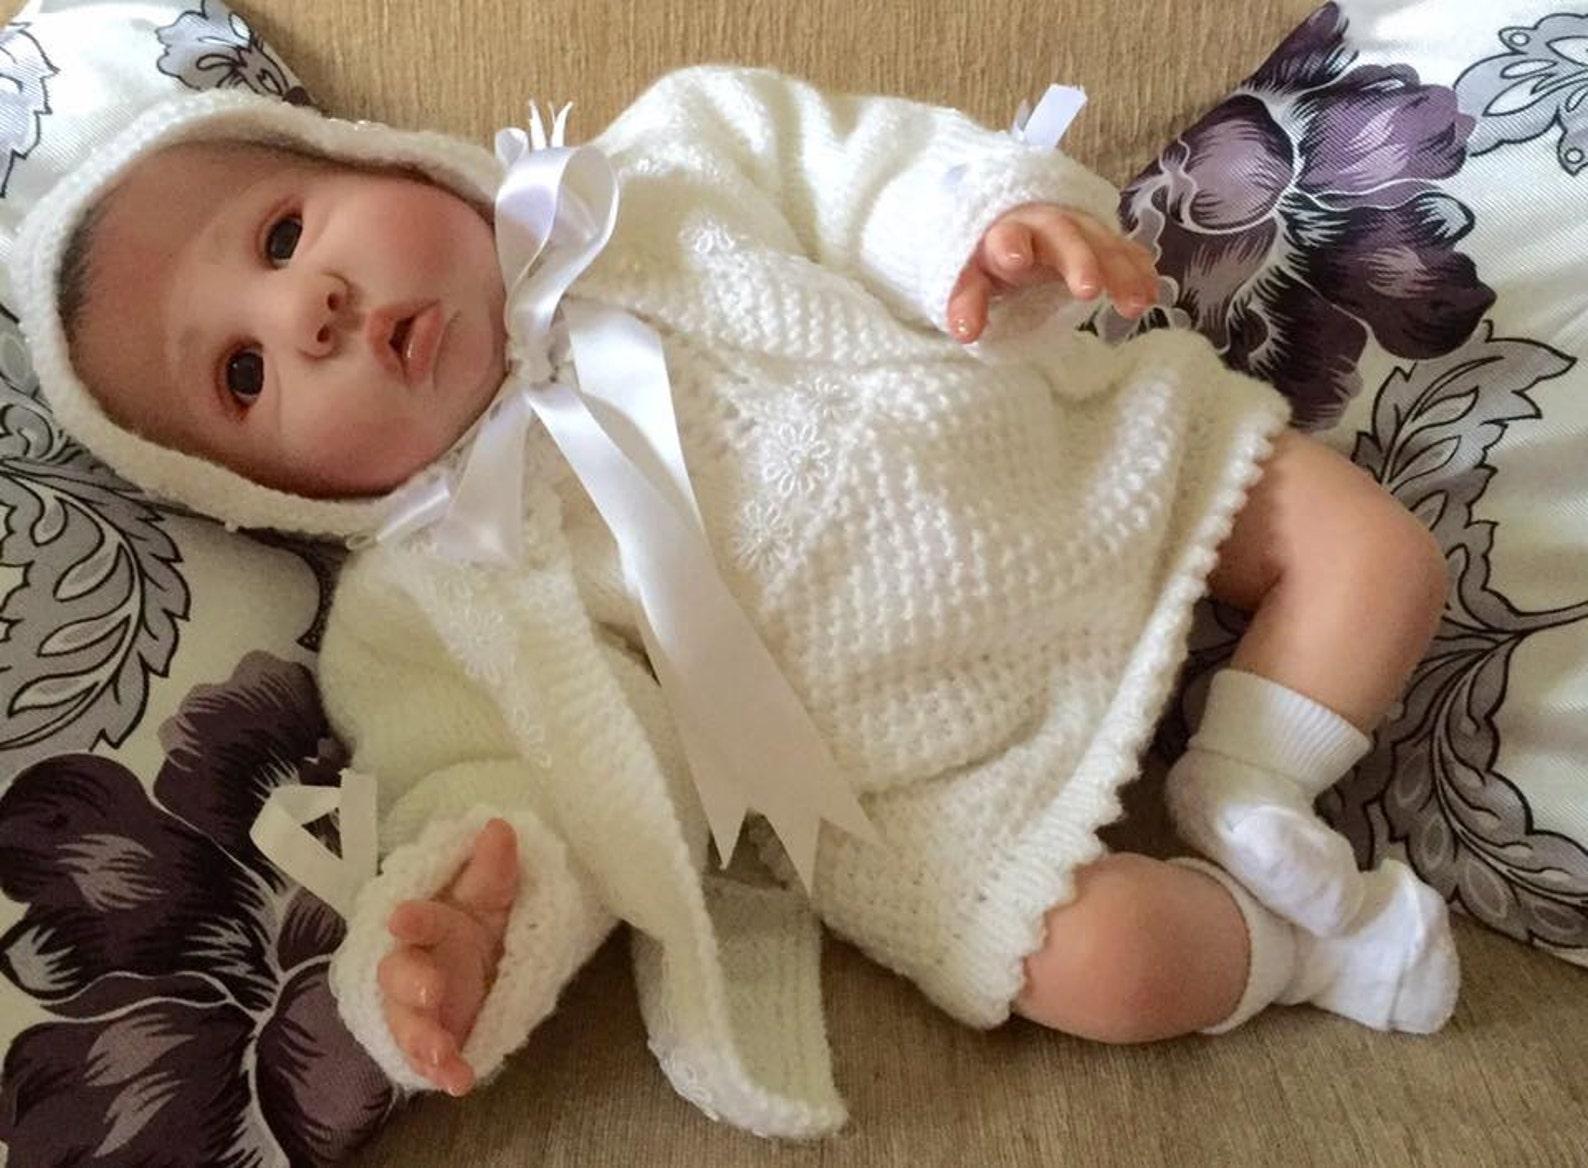 baby knitting patterns - princess range, bonnet, ballet shoes, cardi sizes 0-6mths approximately